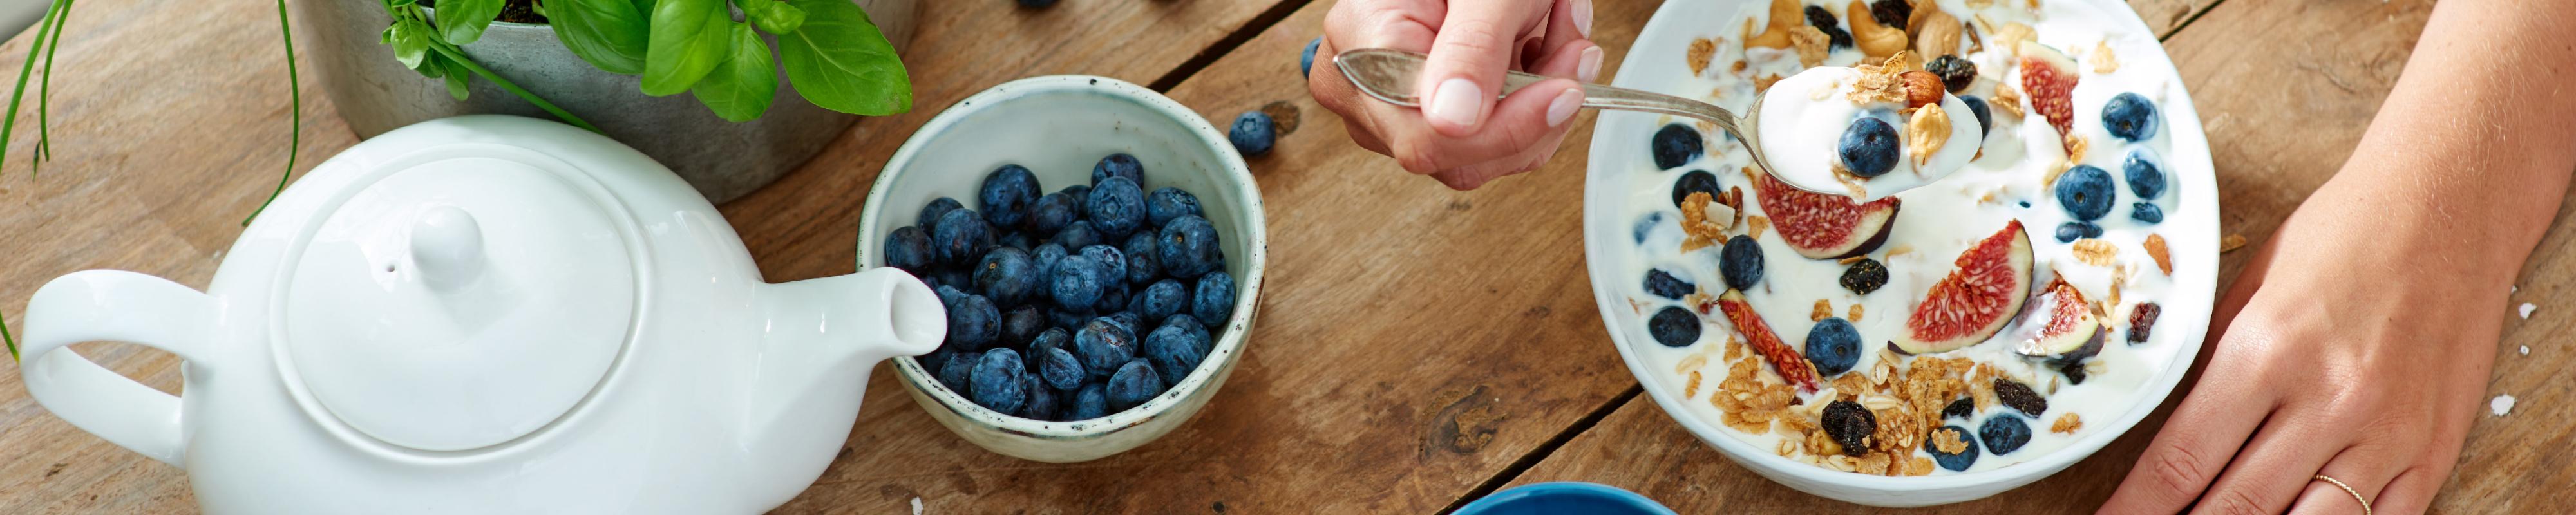 Yoghurt met fruit en muesli